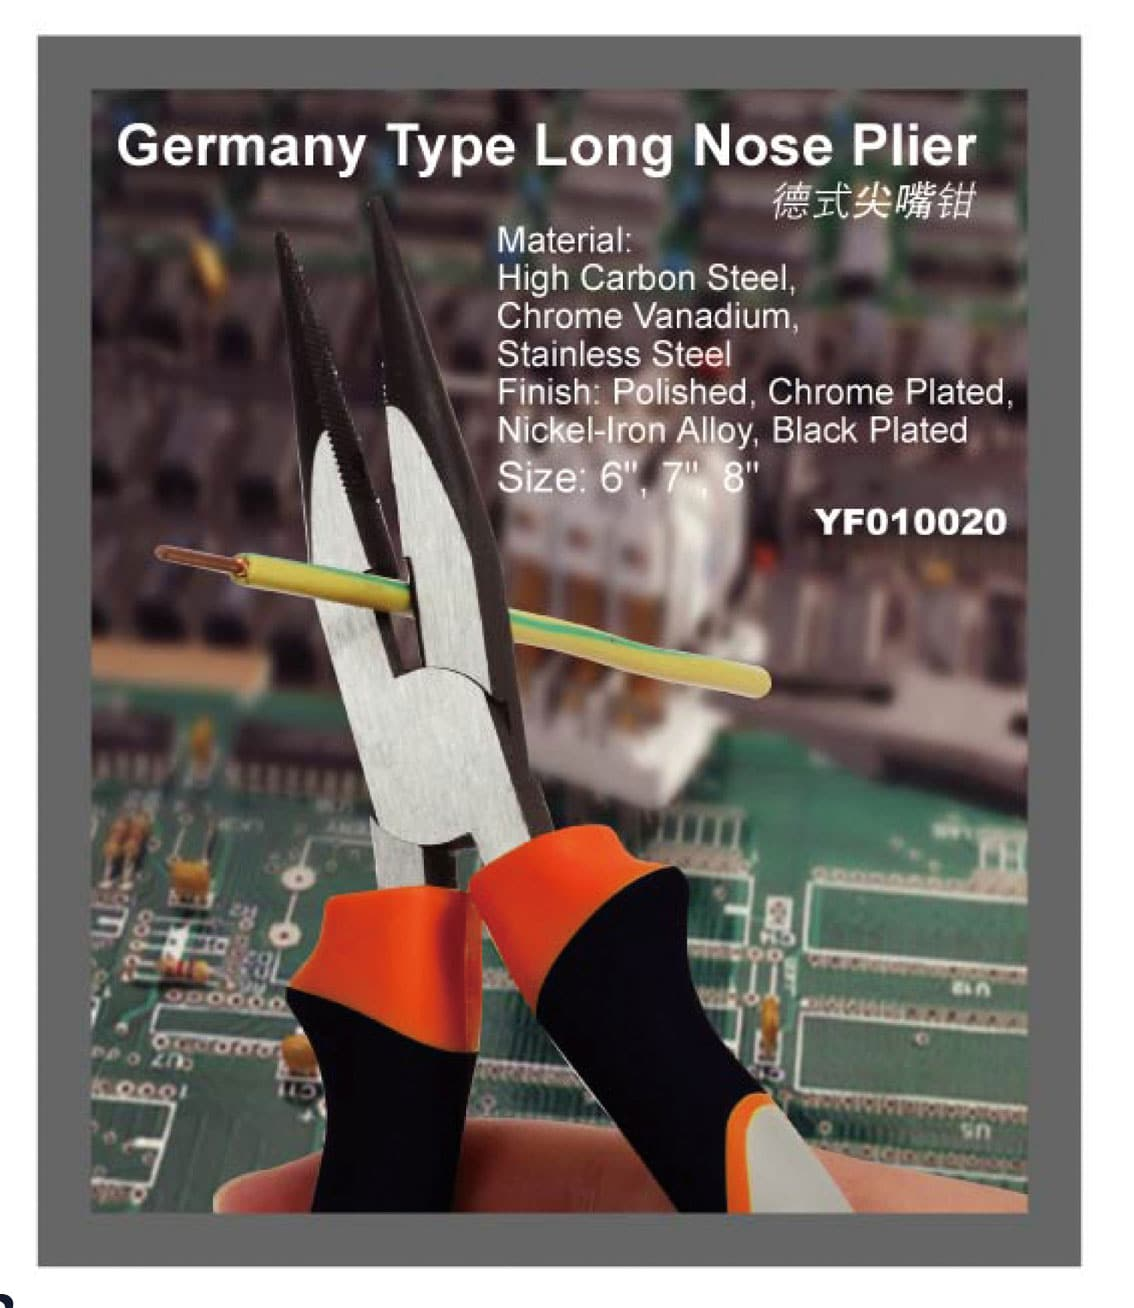 Germany Type Long Nose Plier | YF010020